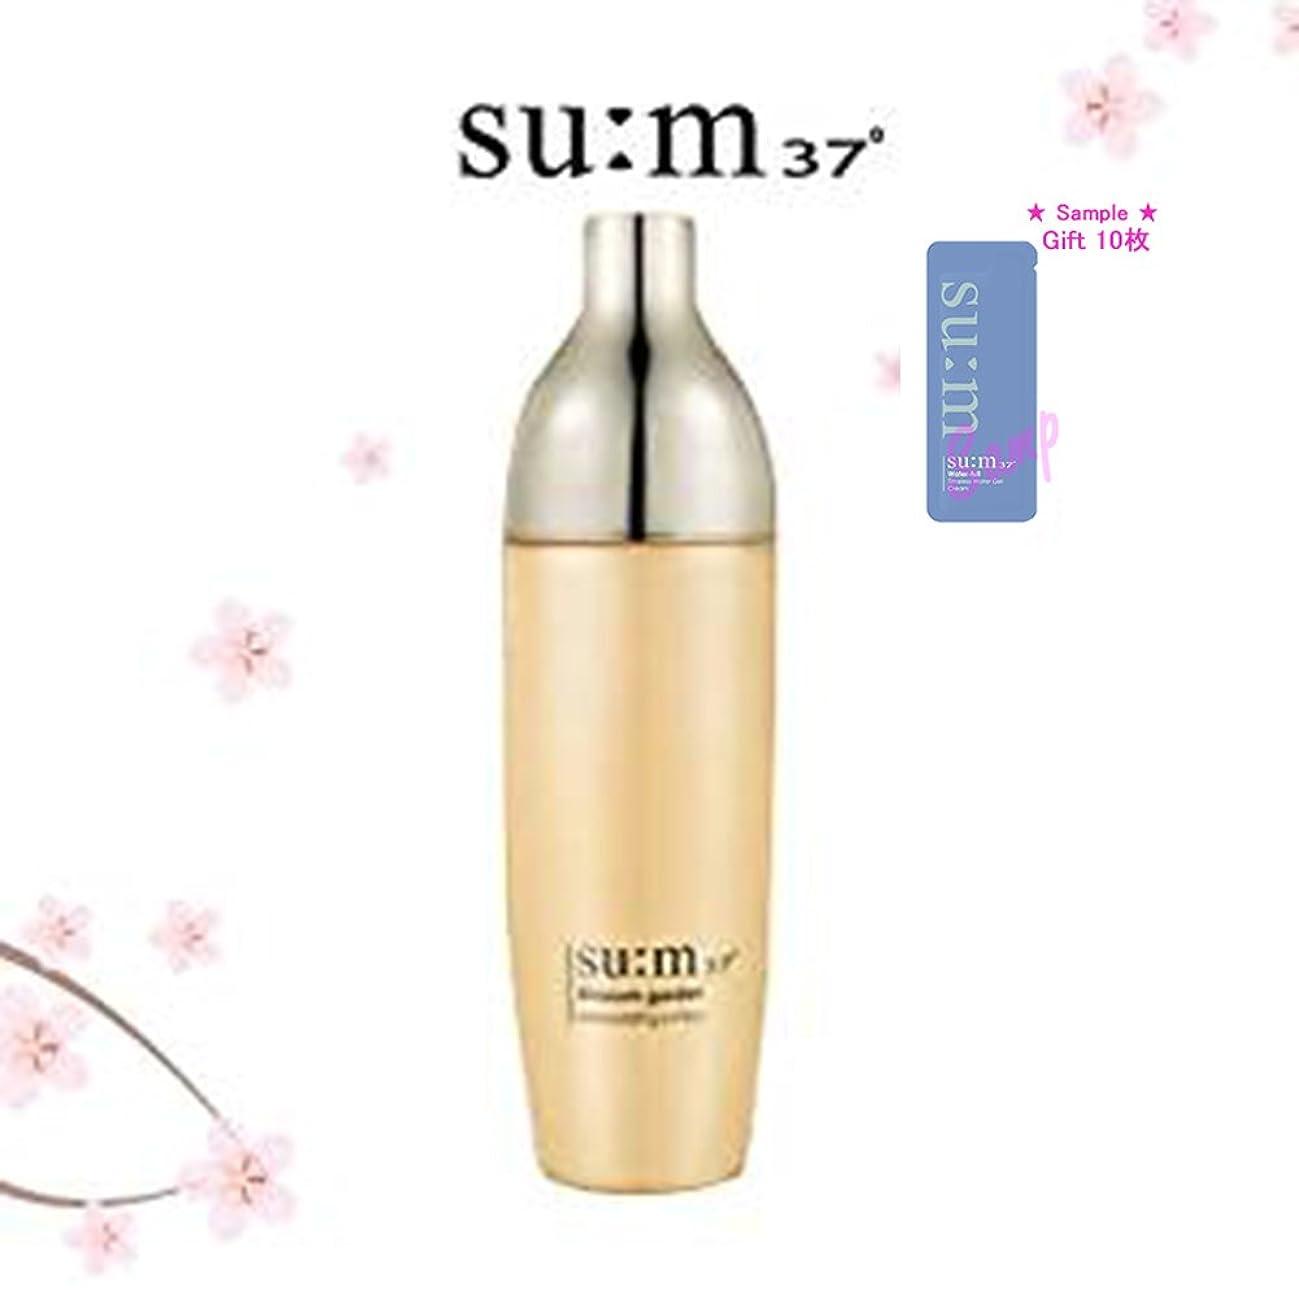 sum37(スム37)ブロッサムガーデンモイスチャライジングスキン150ml(blossom garden moisturizing skin)